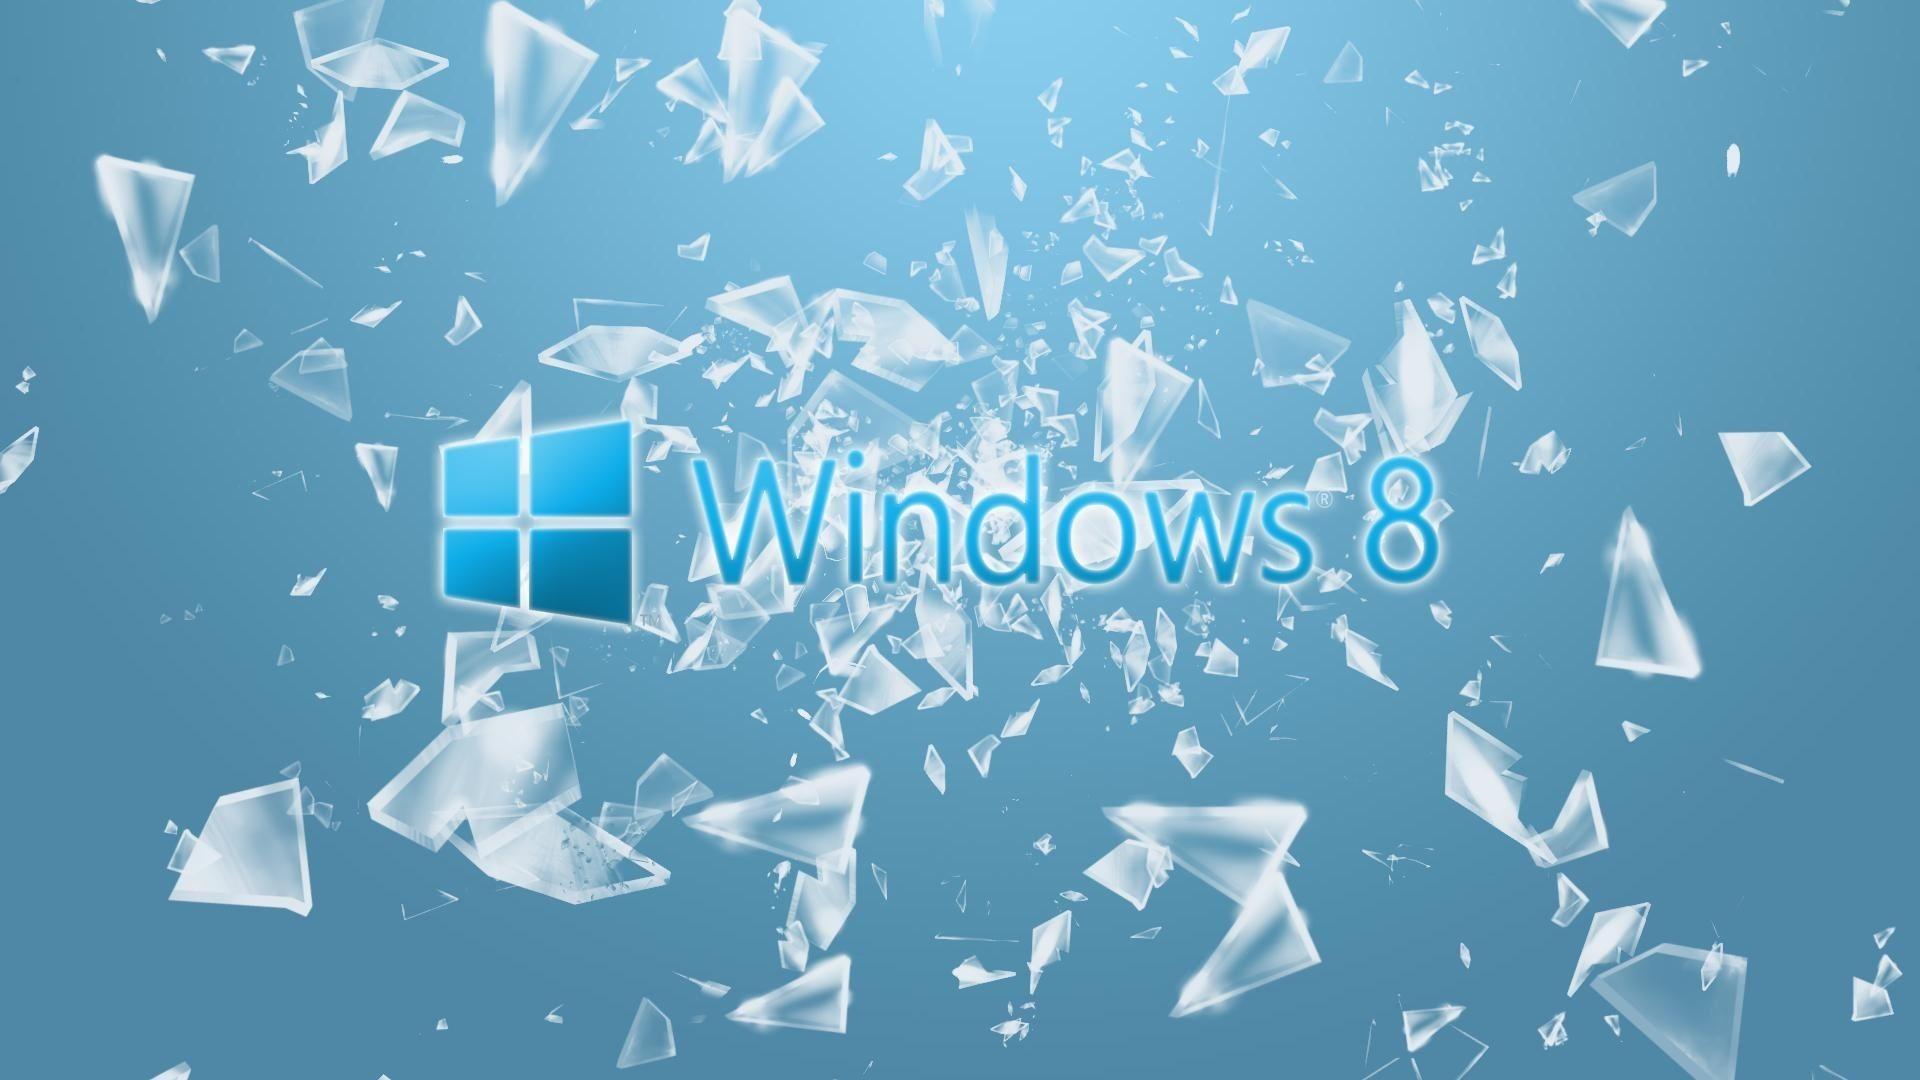 Fresh Live Wallpaper Hd For Windows 8 1 Windows Wallpaper Wallpaper Pc Anime Wallpaper Anime live wallpaper windows 81